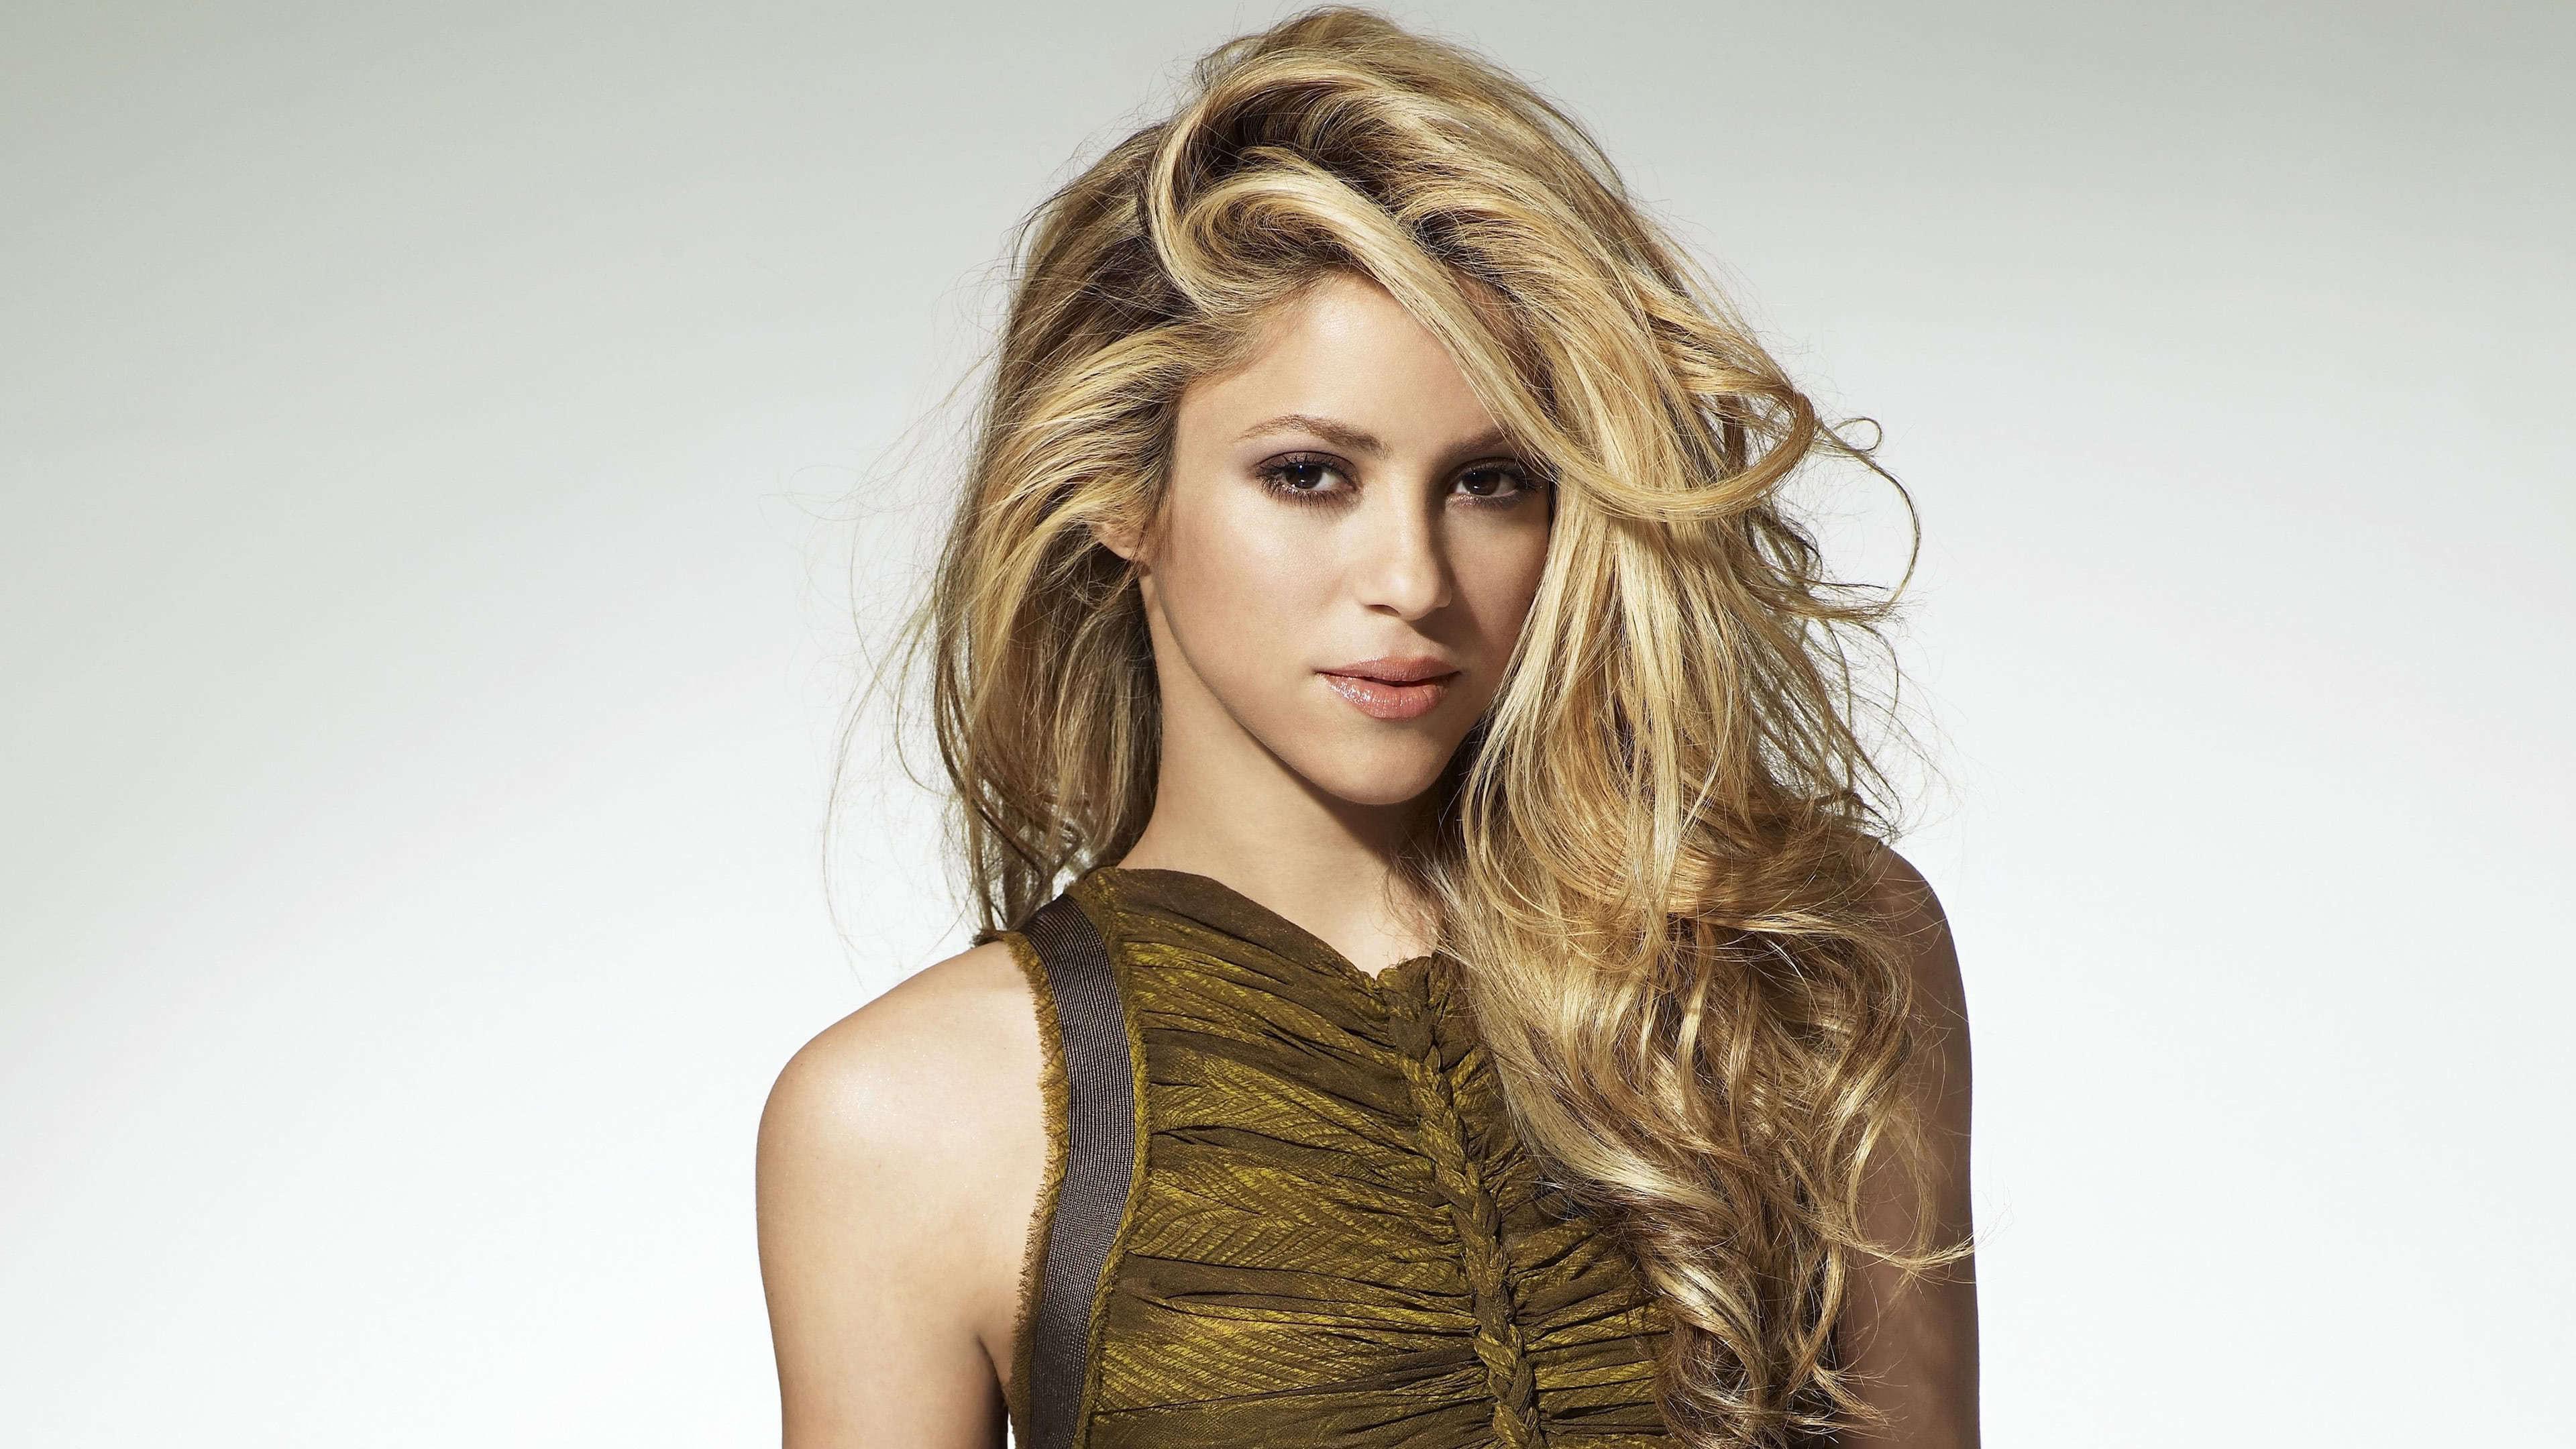 Шакира вака вака, Shakira - Waka Waka (FifaWorld Cup) - скачать 29 фотография